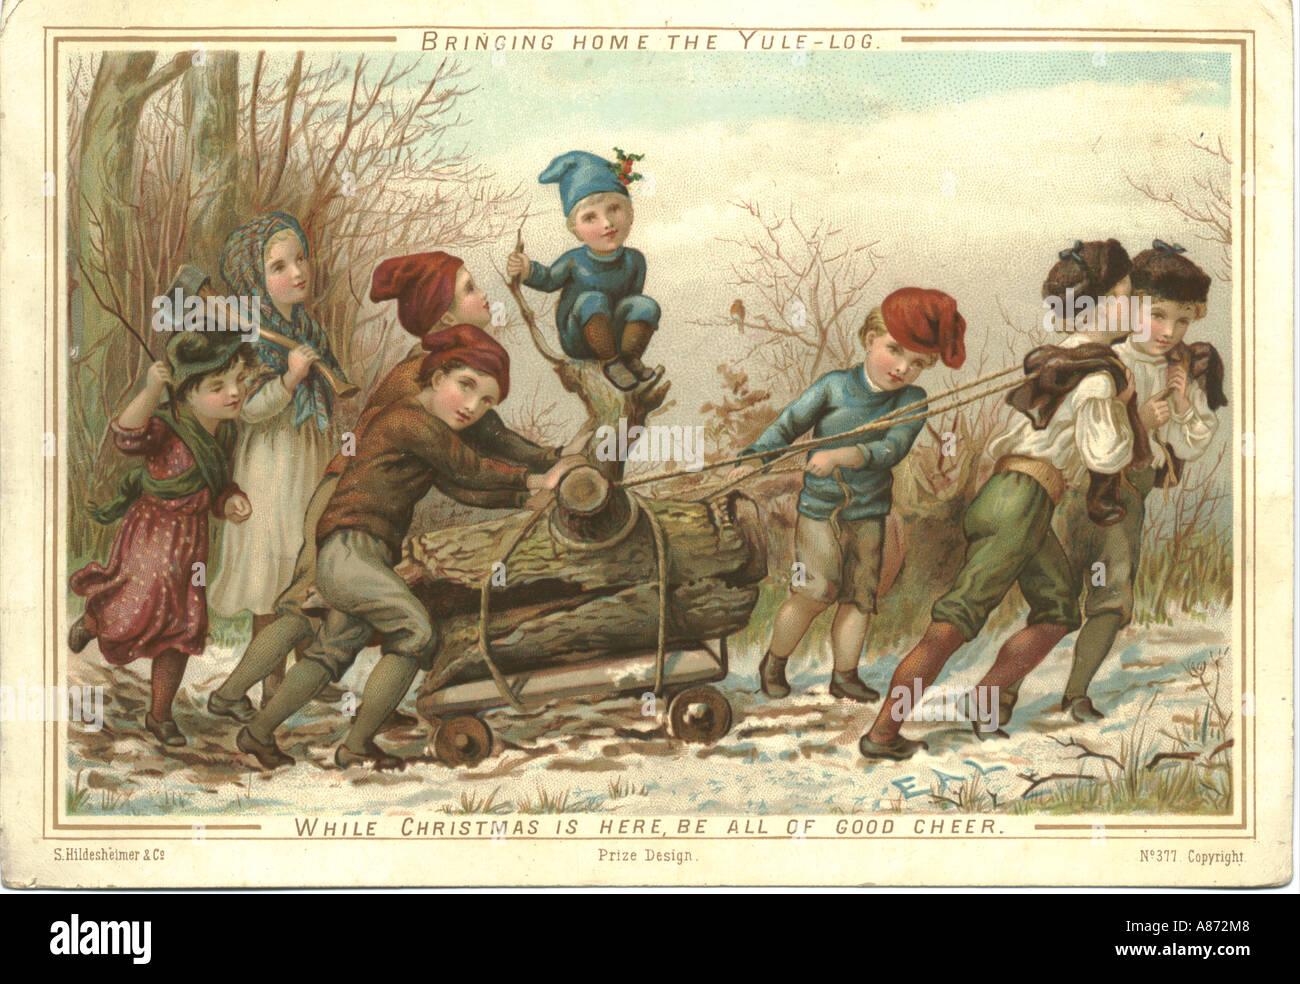 Christmas greeting card circa 1881 by eliza ann lemann titled christmas greeting card circa 1881 by eliza ann lemann titled bringing home the yule log kristyandbryce Choice Image